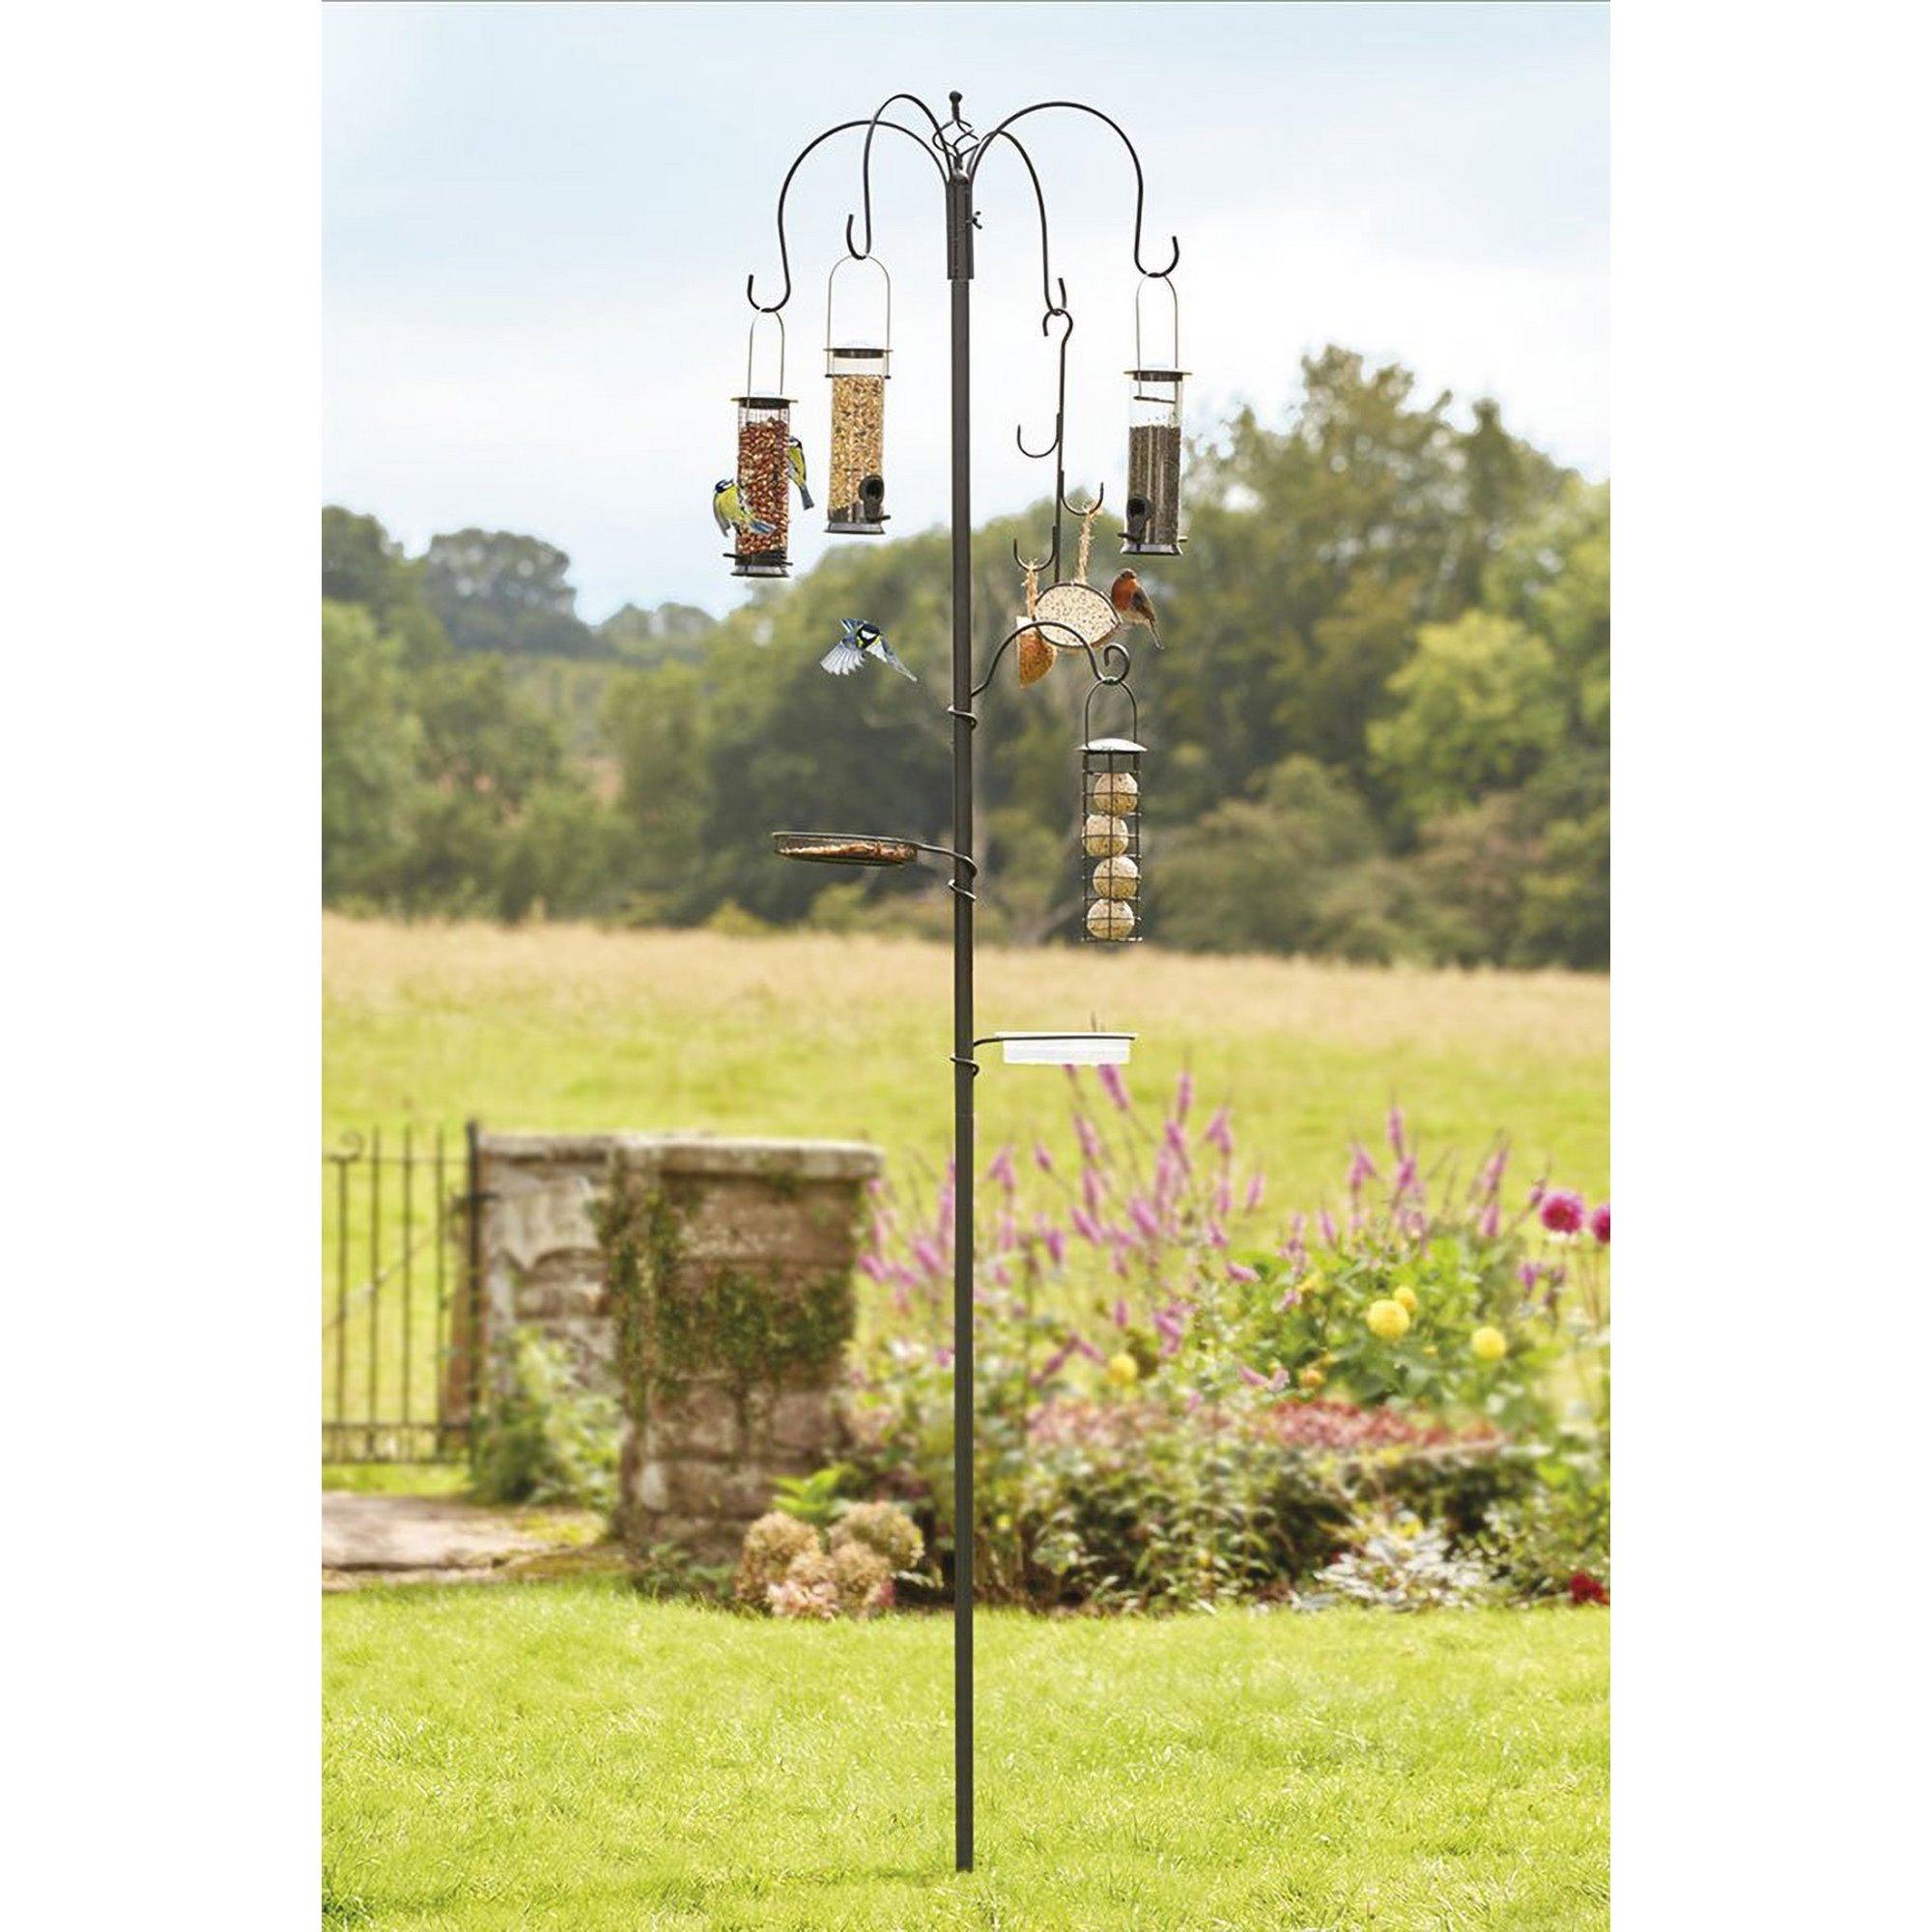 Image of Bird Feeding Station with 4 Birdfeeders